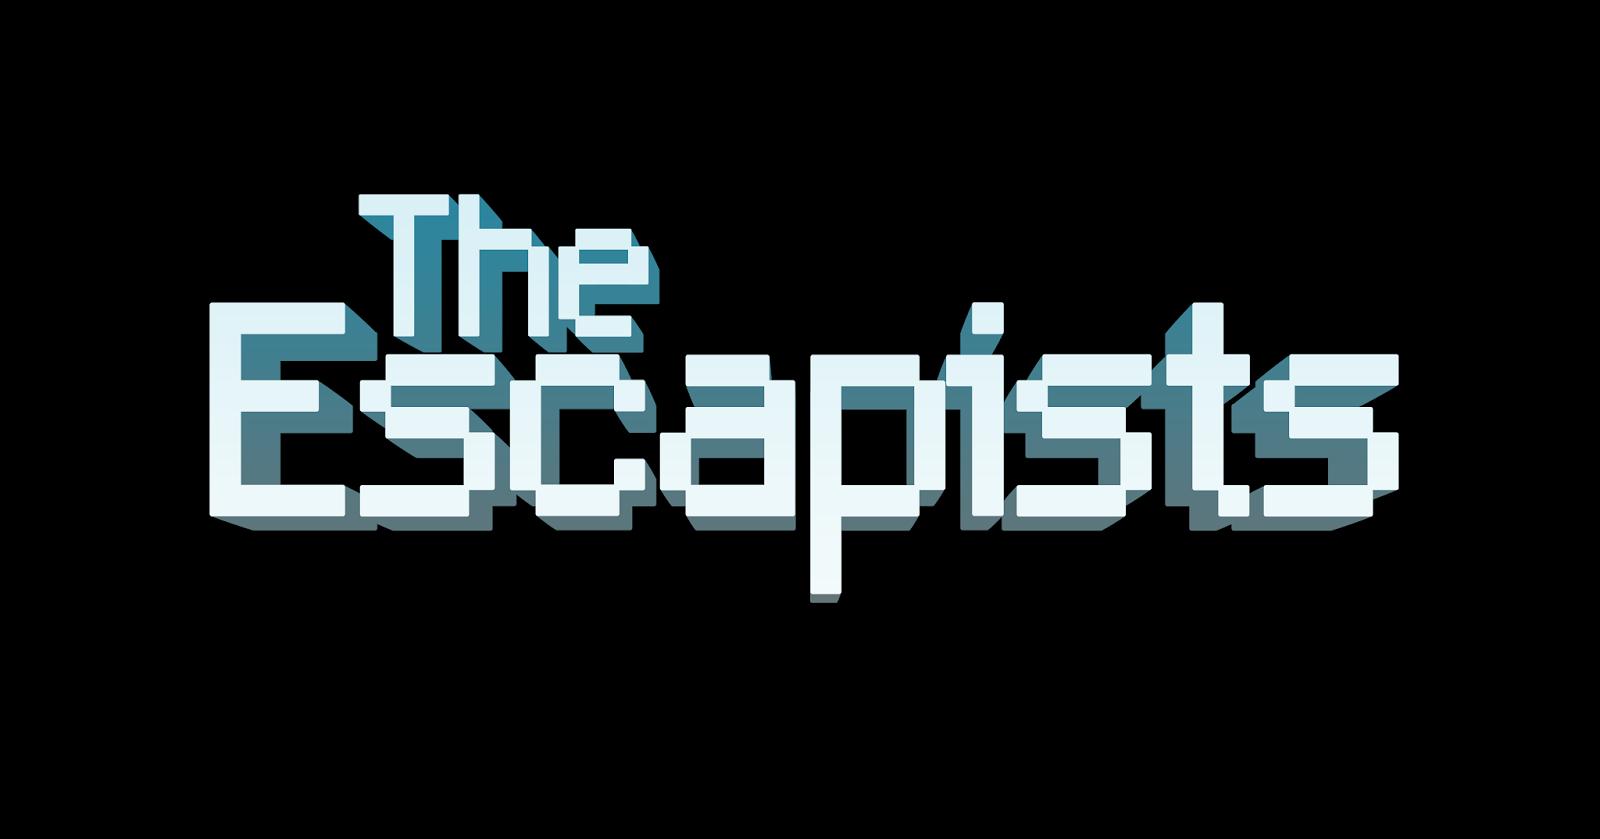 The Escapists llegará a teléfonos móviles este 2 de marzo